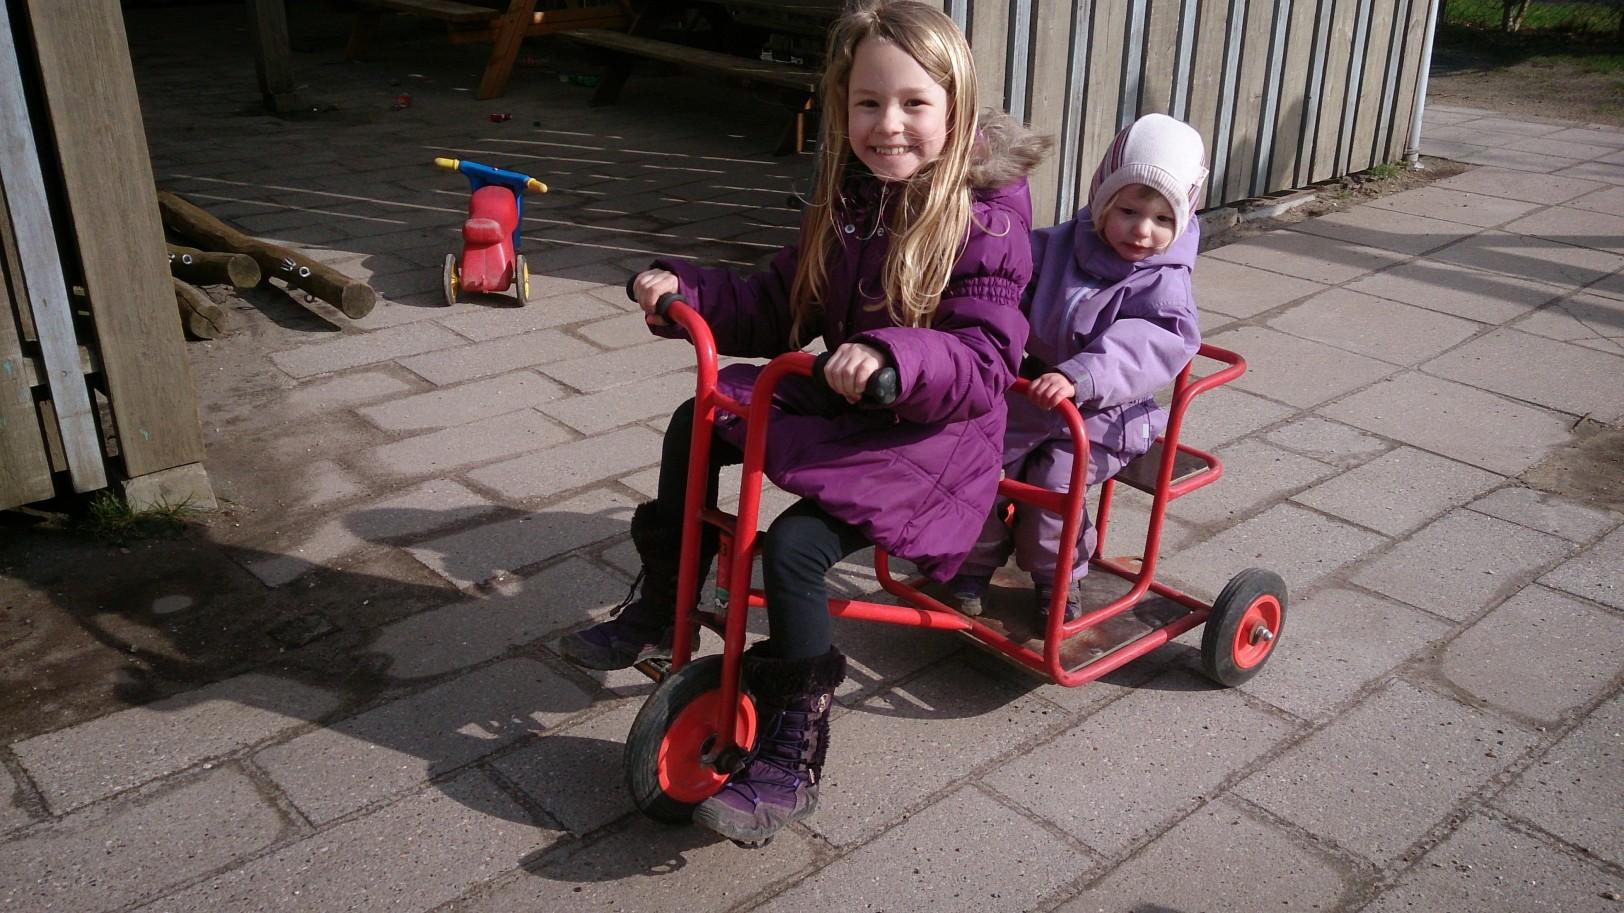 Liva showing true bike skills